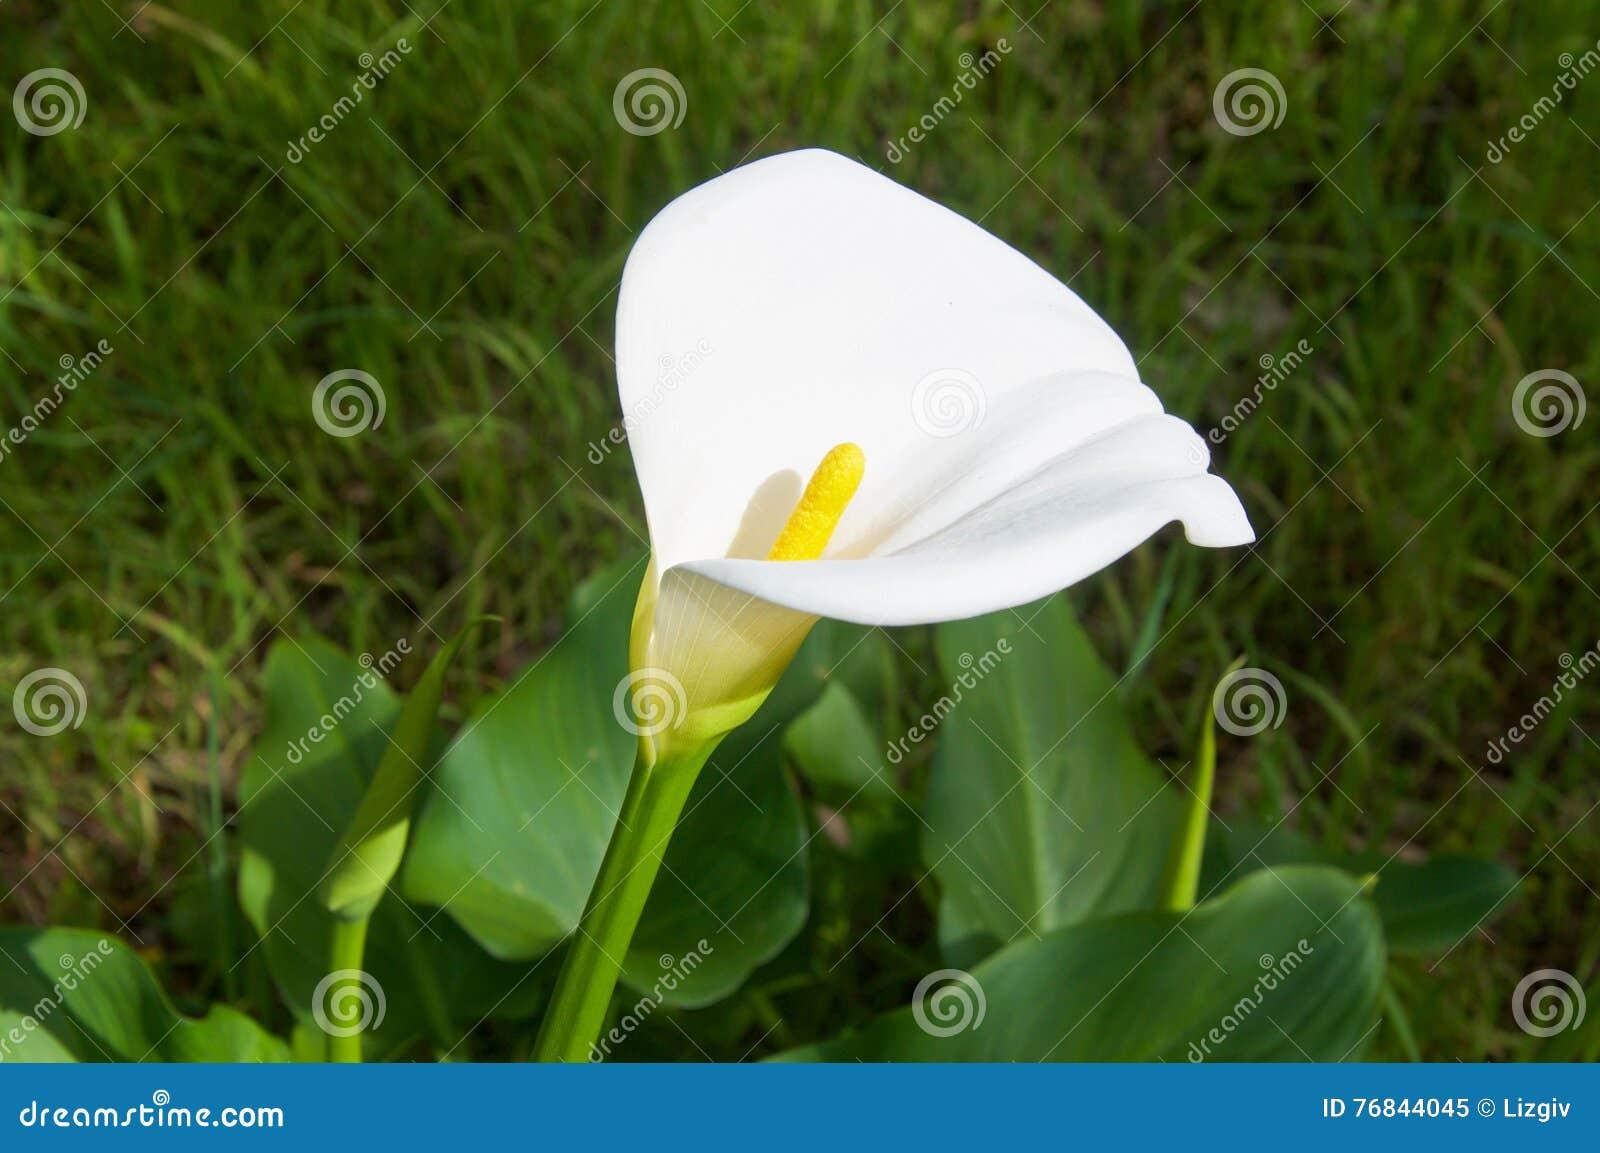 White flower with yellow stem image collections flower decoration white flower with yellow stem images flower decoration ideas white flower with yellow stem choice image mightylinksfo